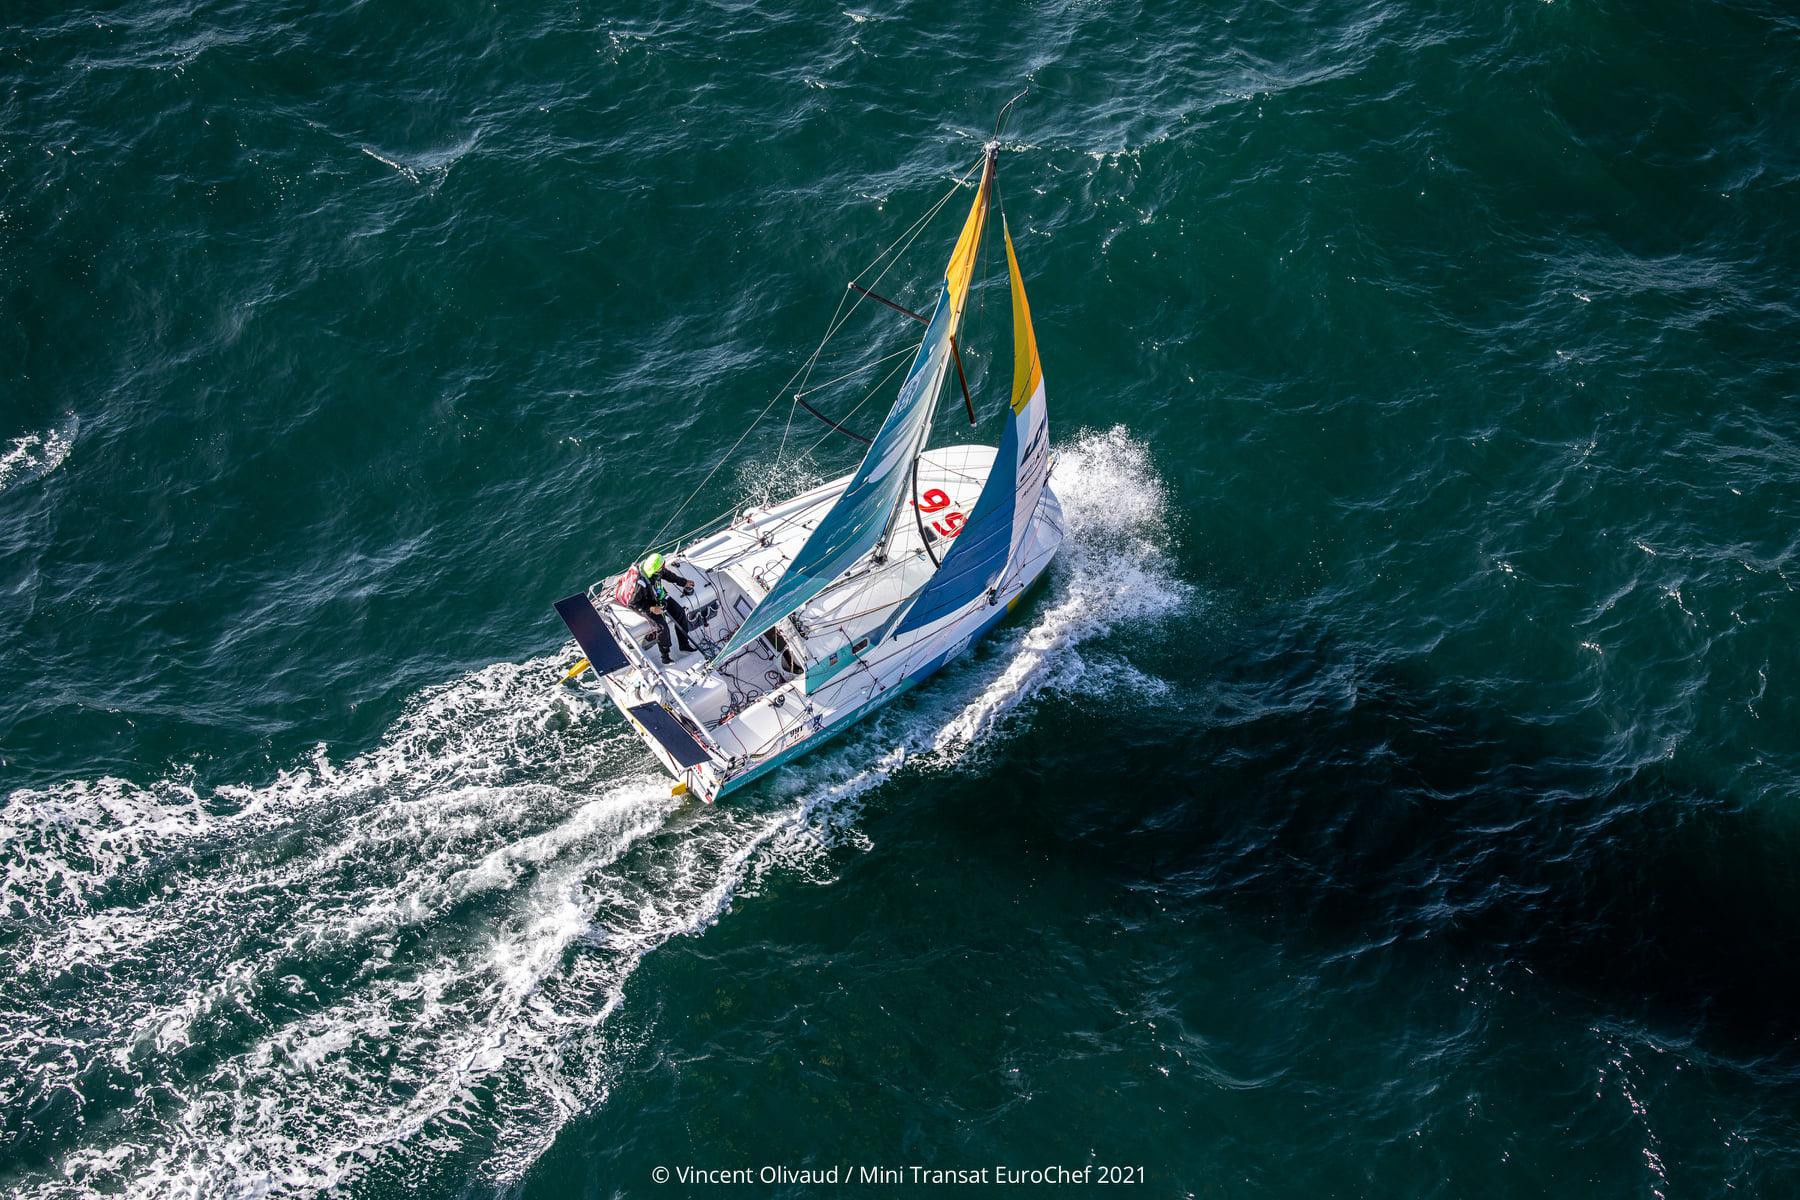 Aerial shot of a boat sailing.